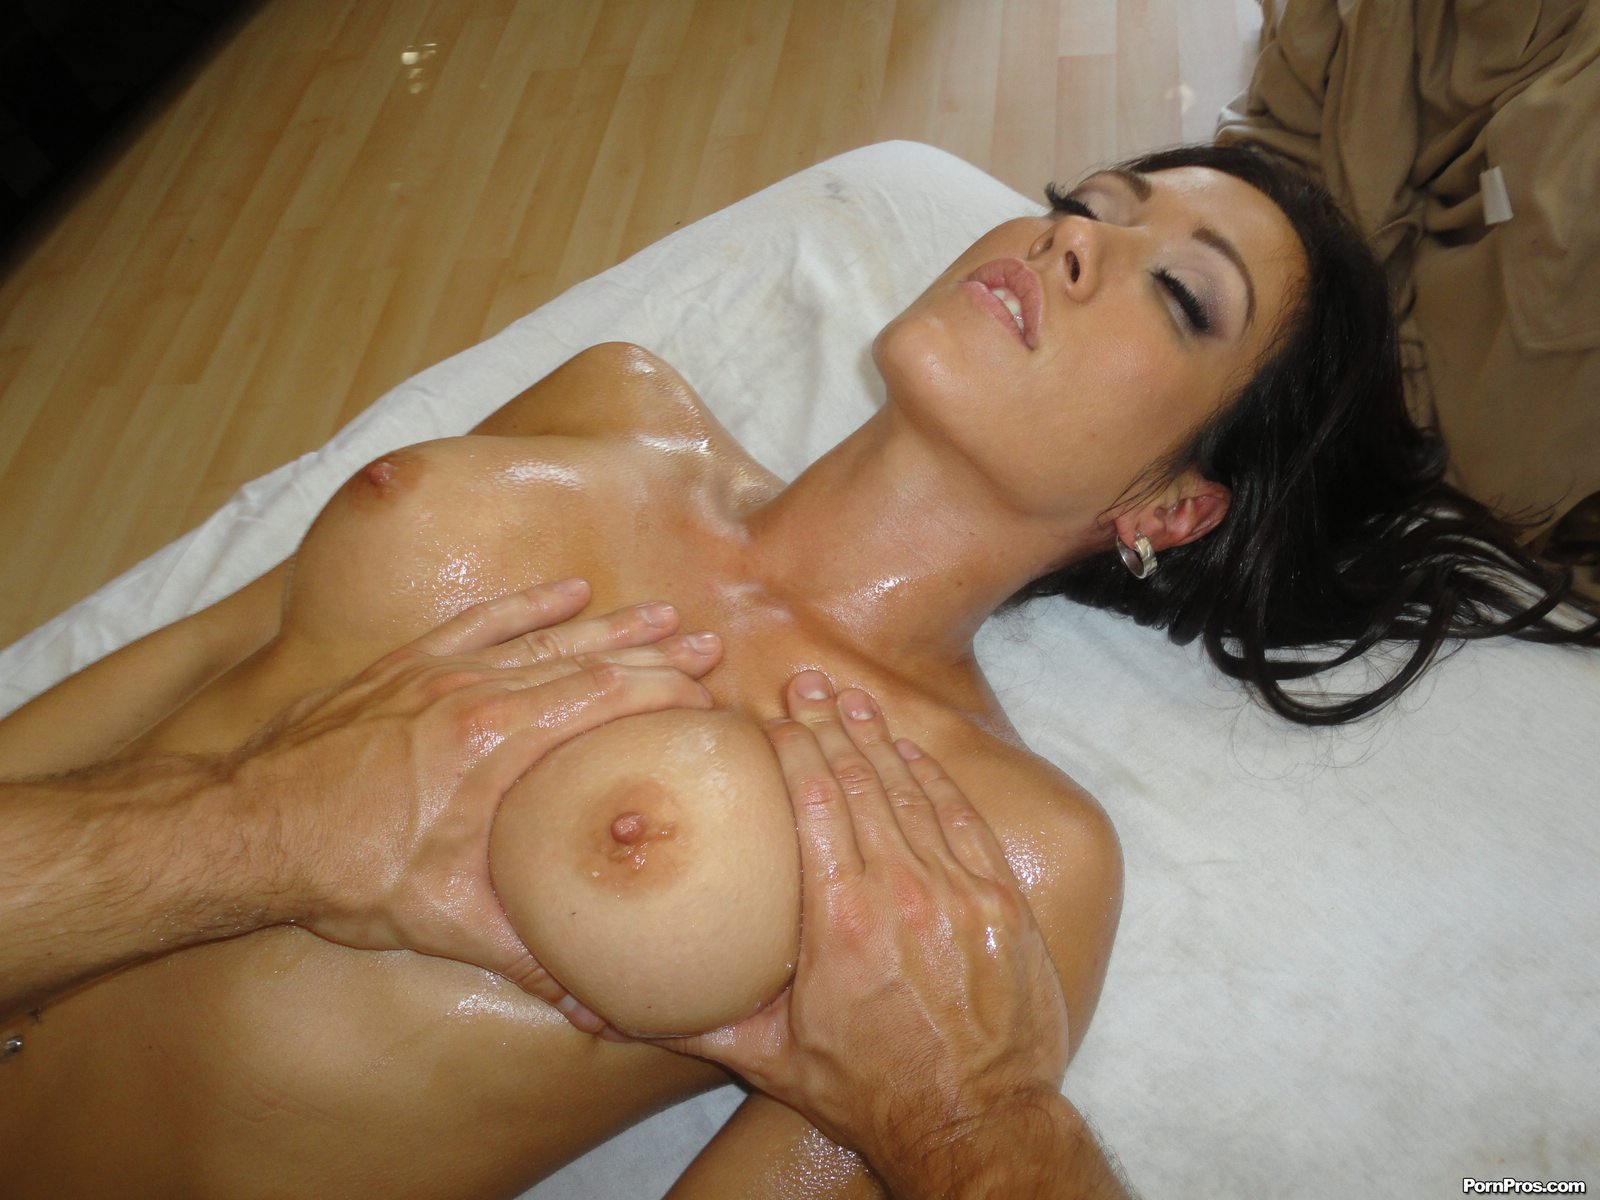 Fucking hot, Capri cavanni massage ass